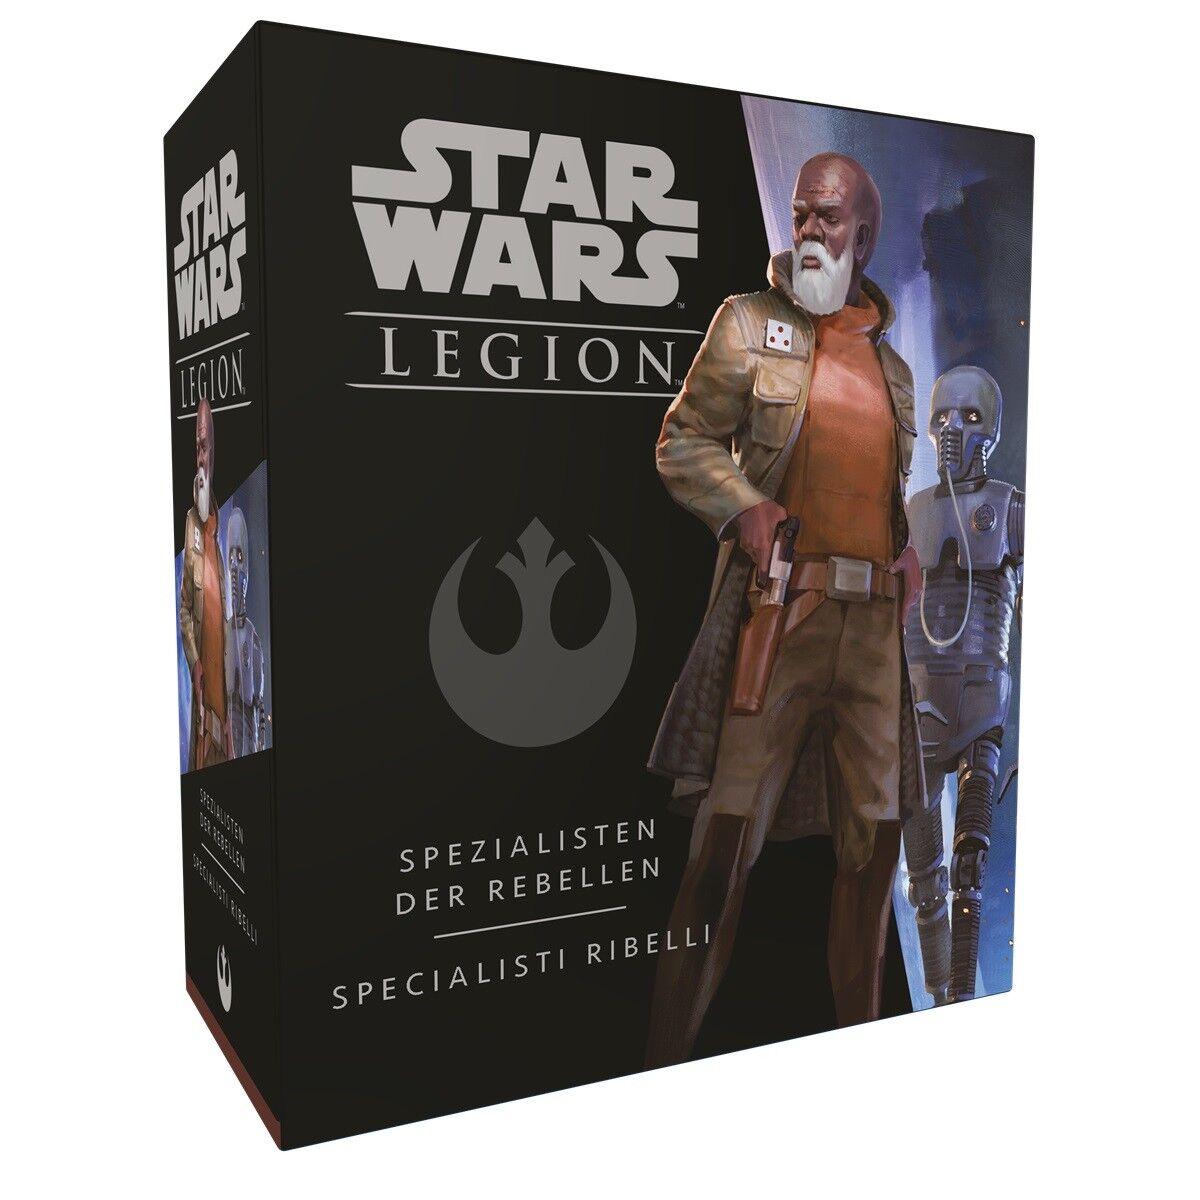 Star Wars Legion Specialists the Rebels Extension (German   Italian) Ffg